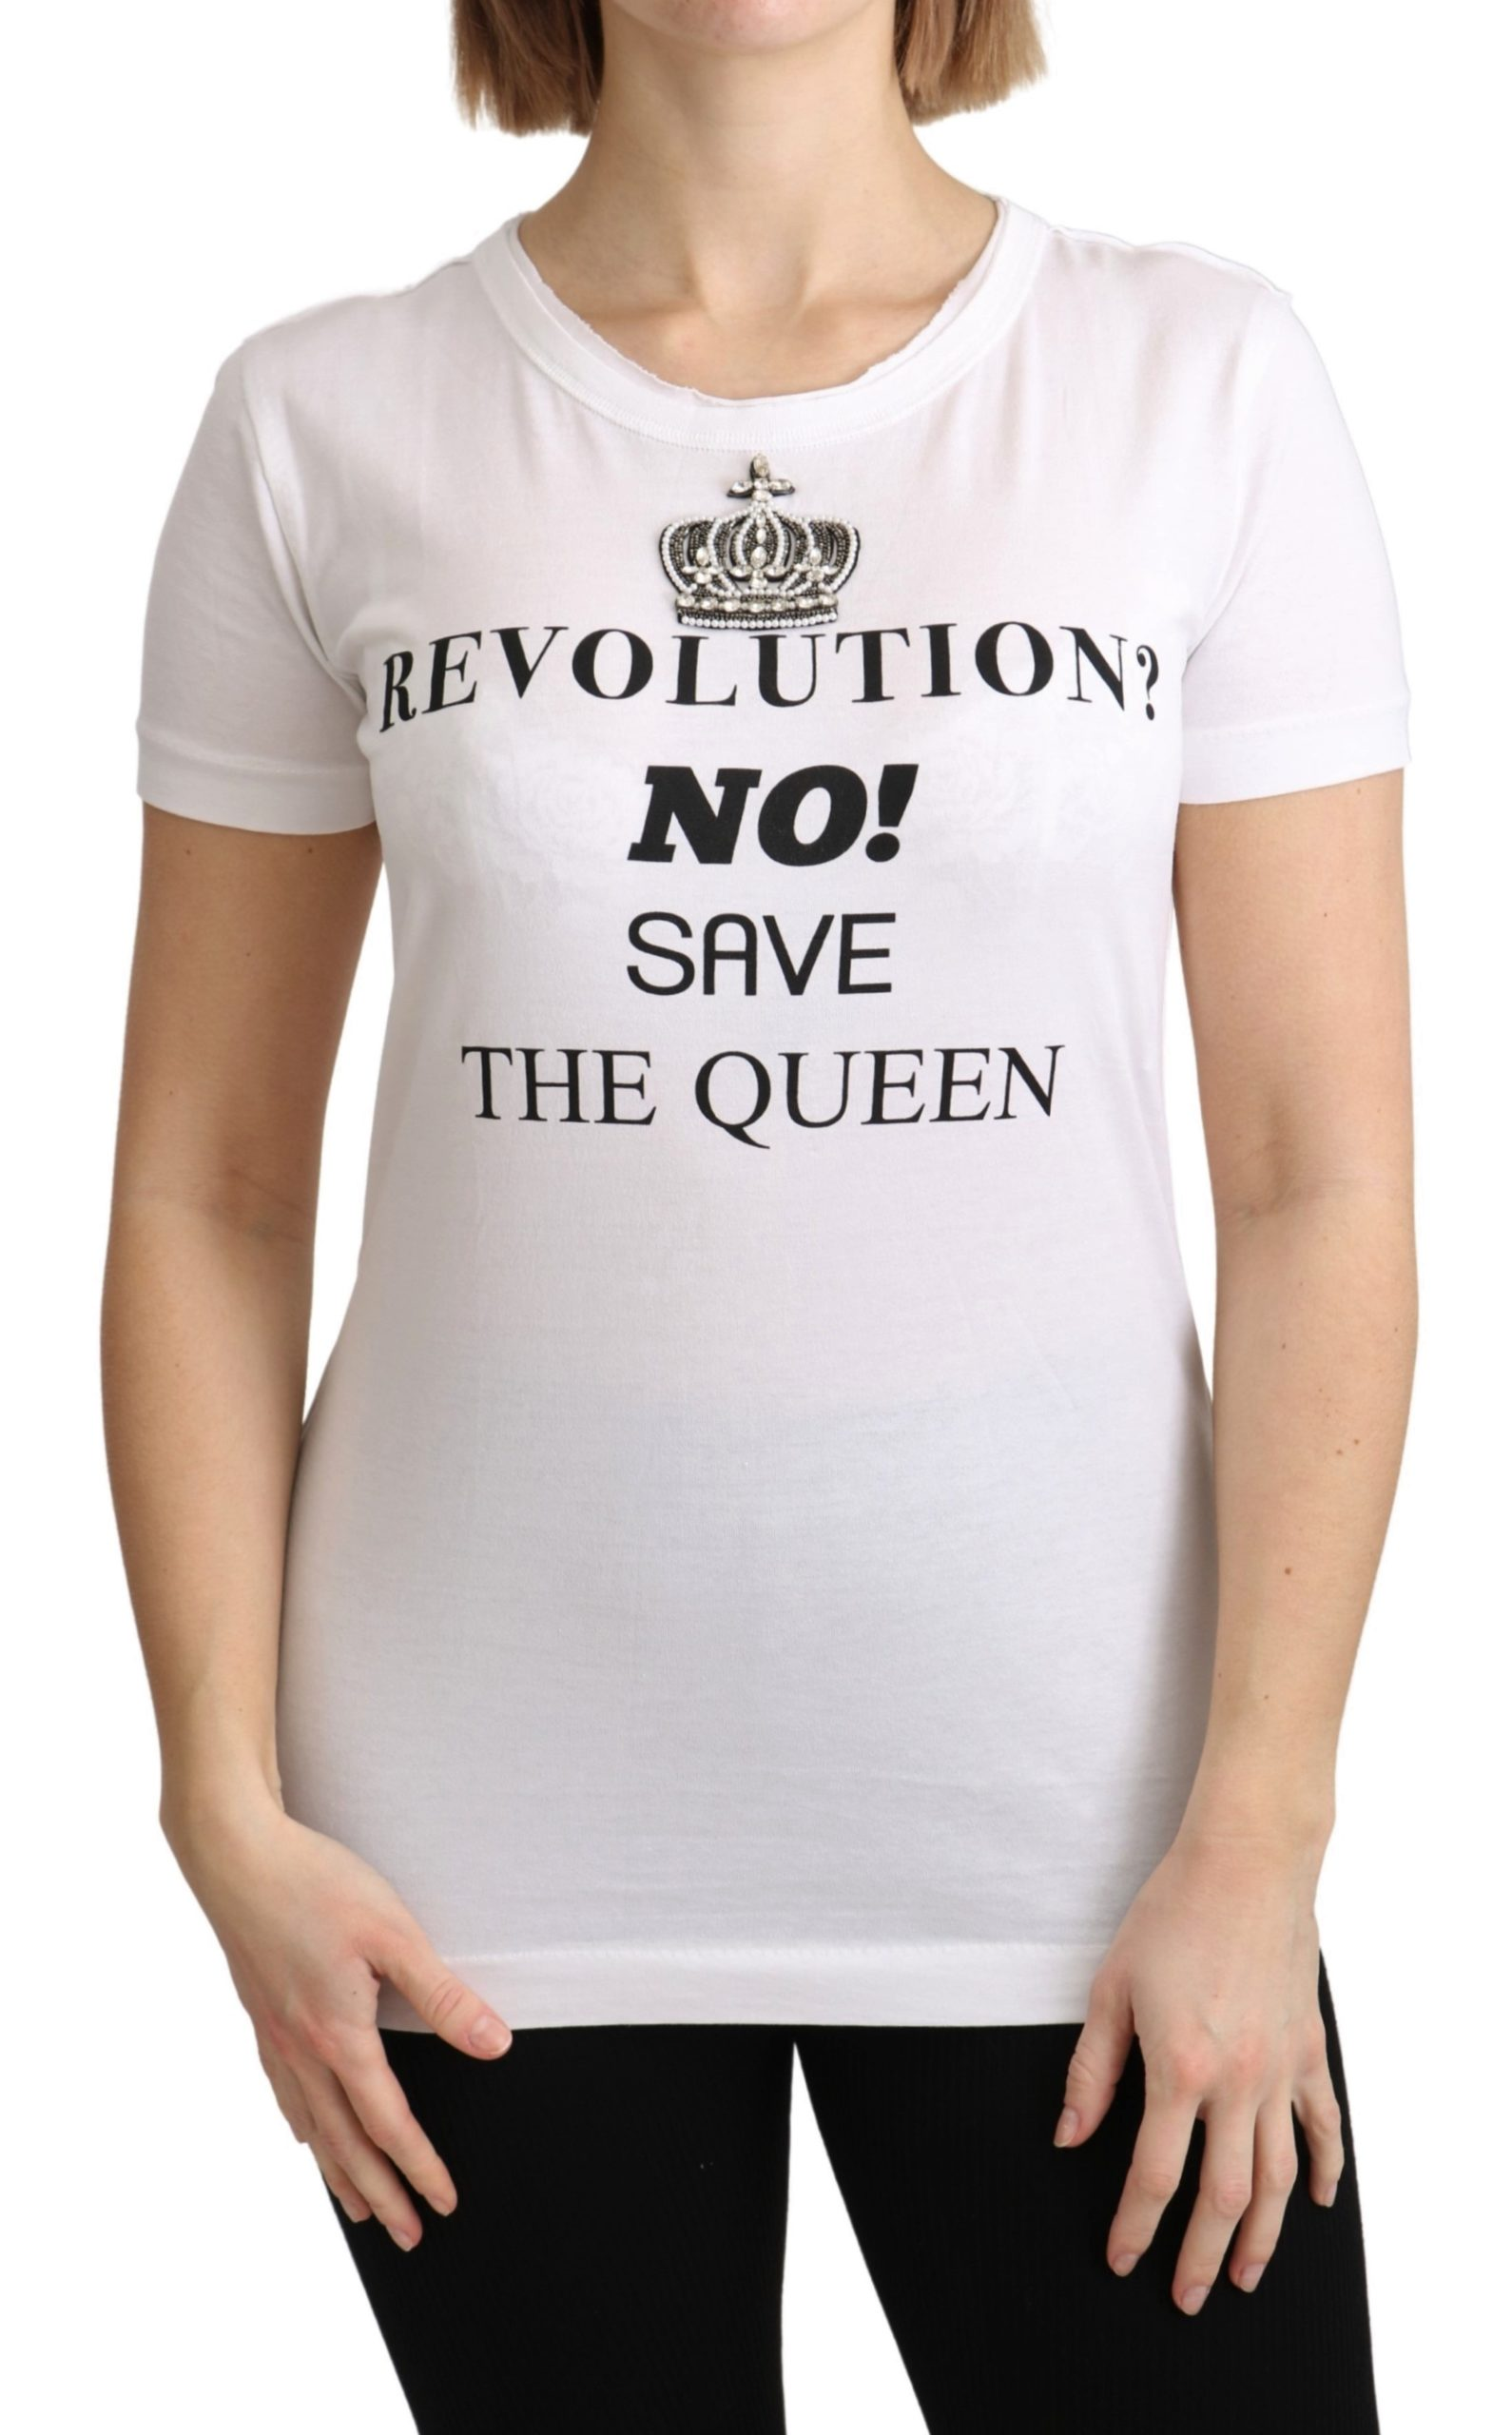 Dolce & Gabbana Women's The Queen Crystal Crewneck T-Shirt White TSH4876 - IT40|S